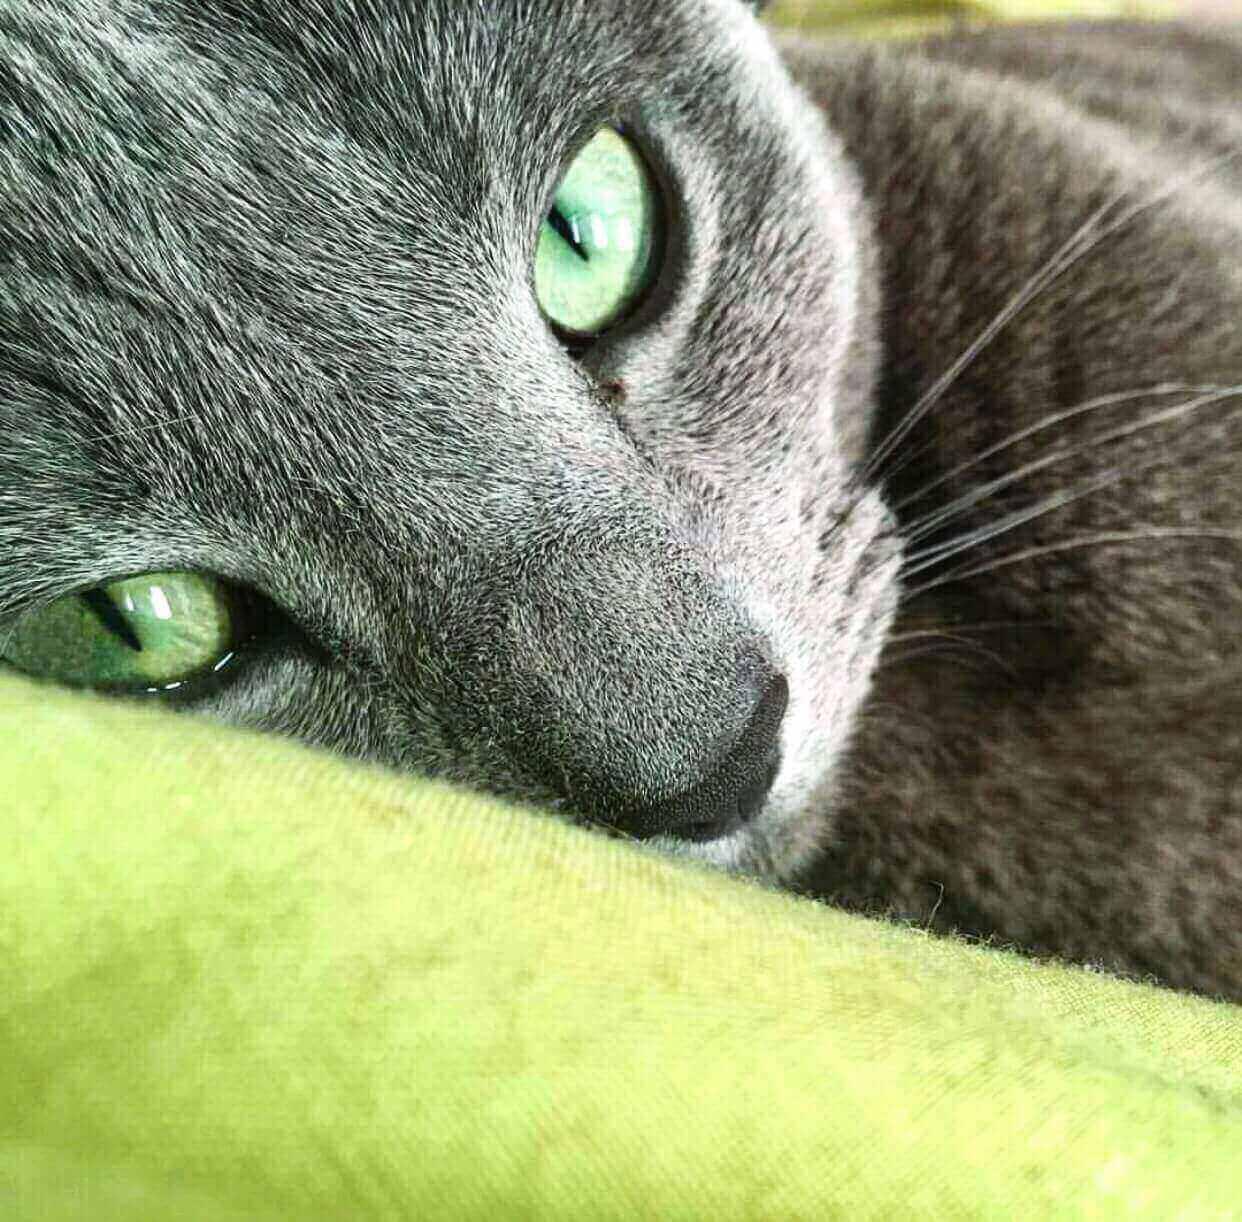 What Age Do Russian Blue Cat's Eye Turn Green